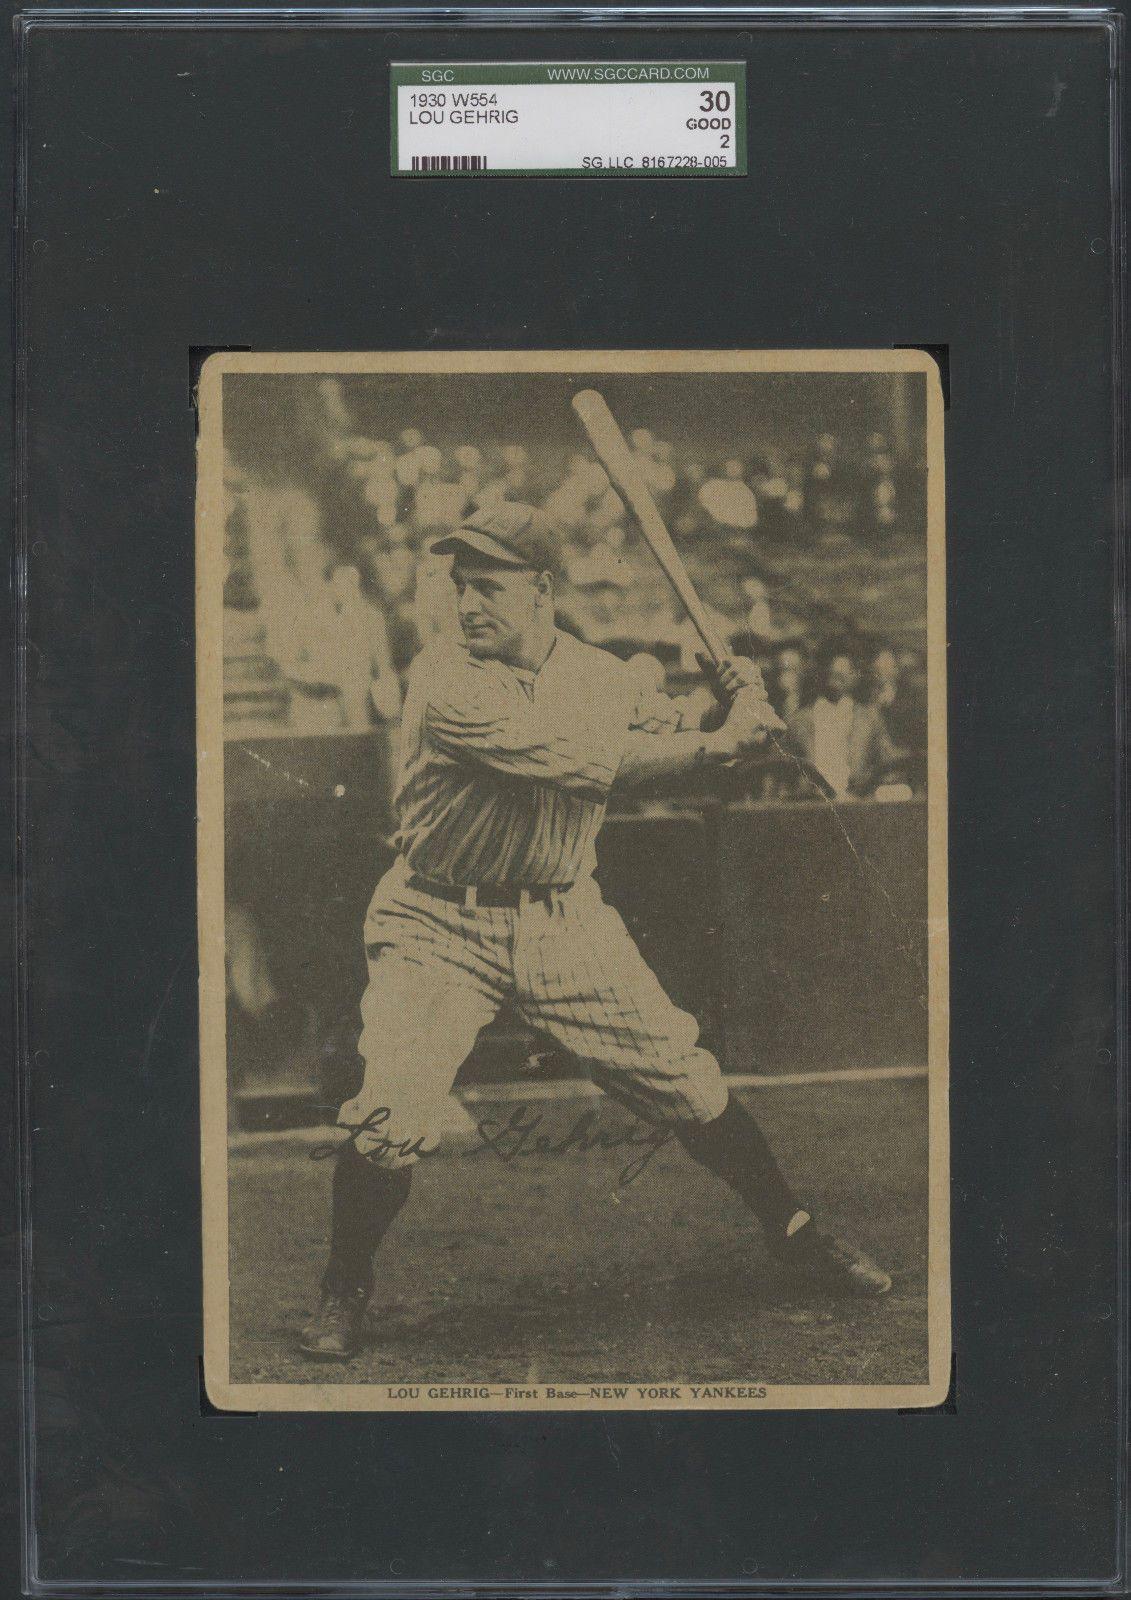 1930 W554 Lou Gehrig SGC 30 Good 2 New York Yankees Hall